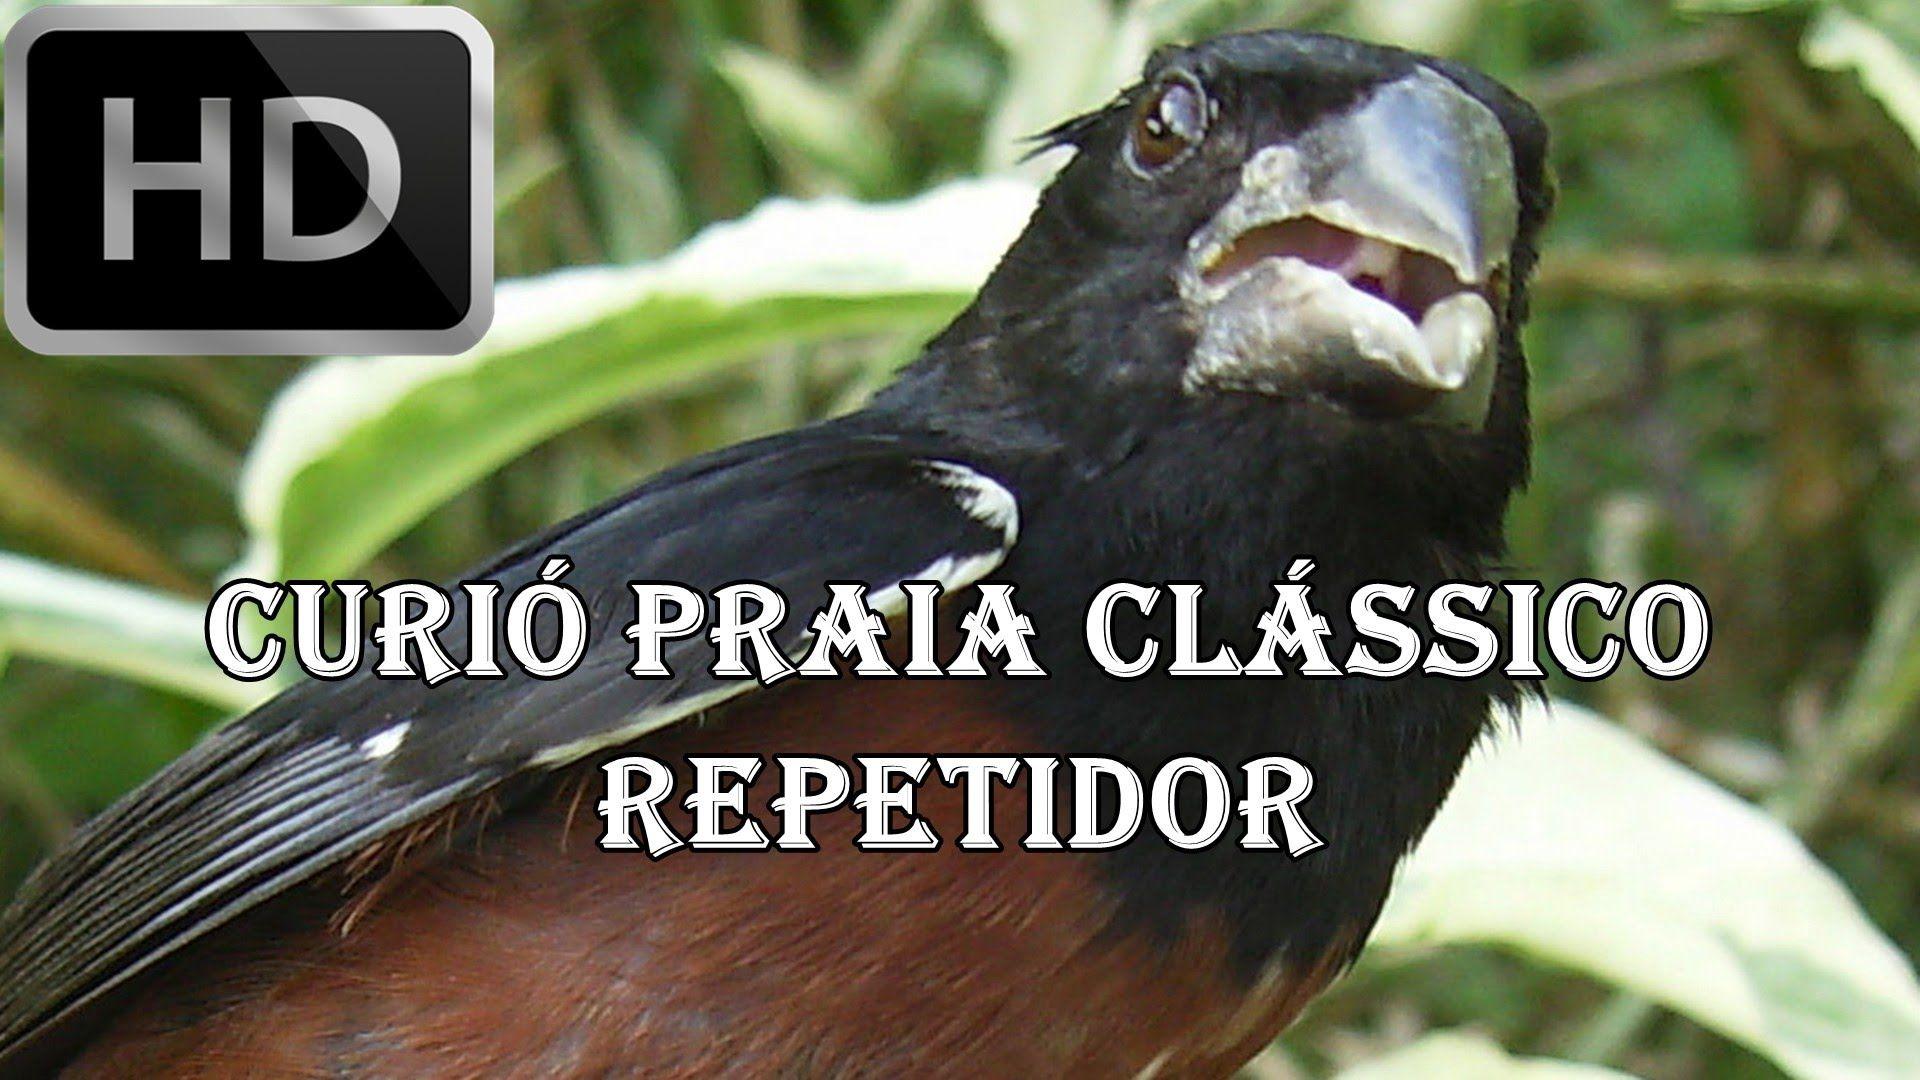 PASSARO CANTO BAIXAR PARA DE CURIO